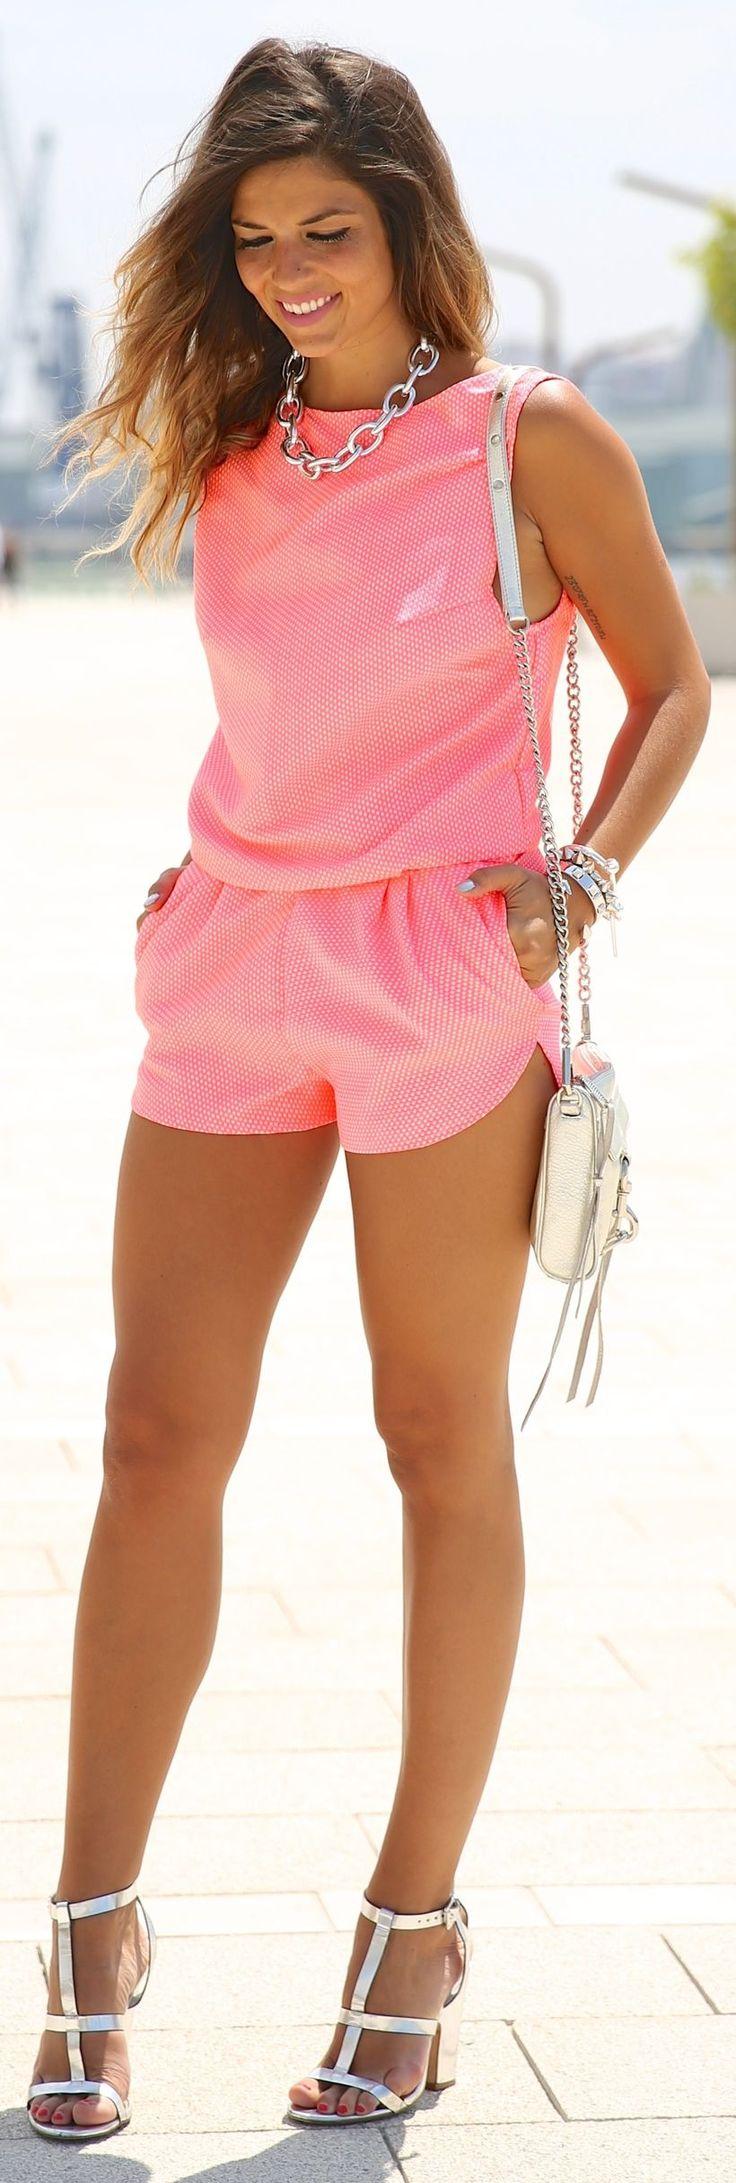 Mekdes Pink Sporty Tailored Polka Dot Playsuit by TrendyTaste